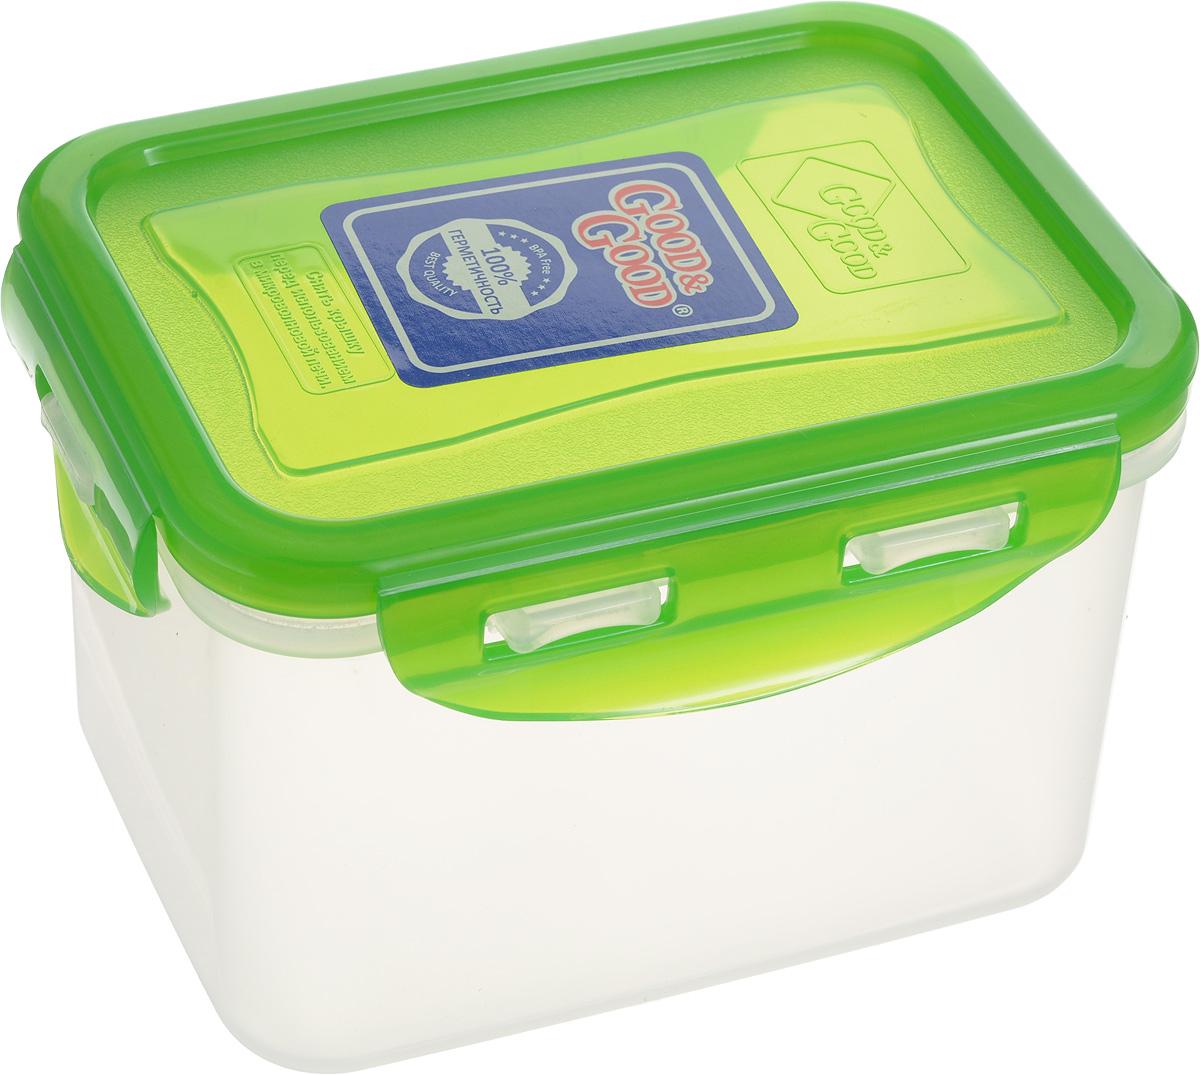 Контейнер пищевой Good&Good, цвет: зеленый, 630 мл. B/COL 02-2 good wives beginner level